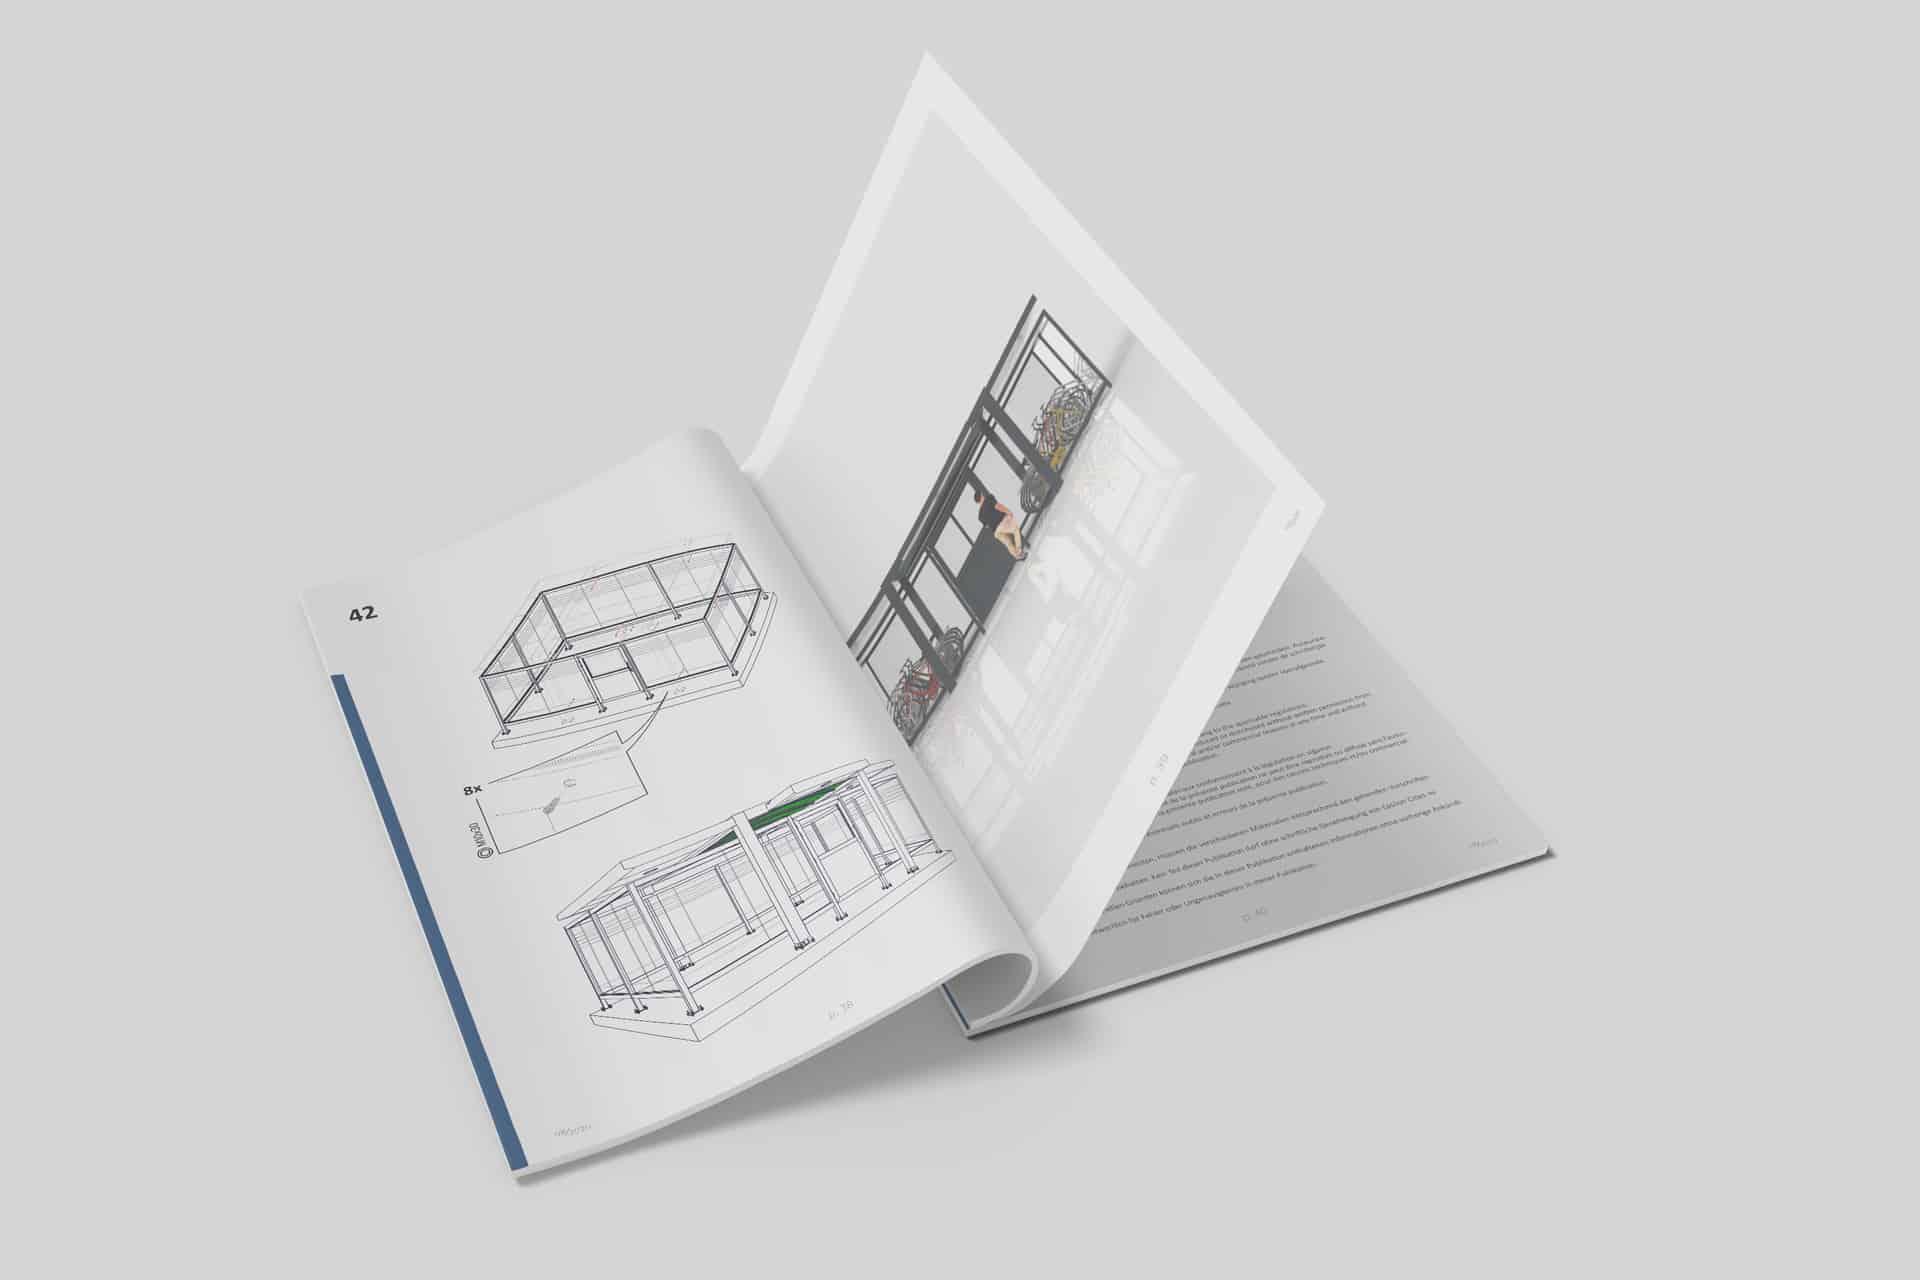 BC manuals: samen visualiseren uw perfecte handleiding